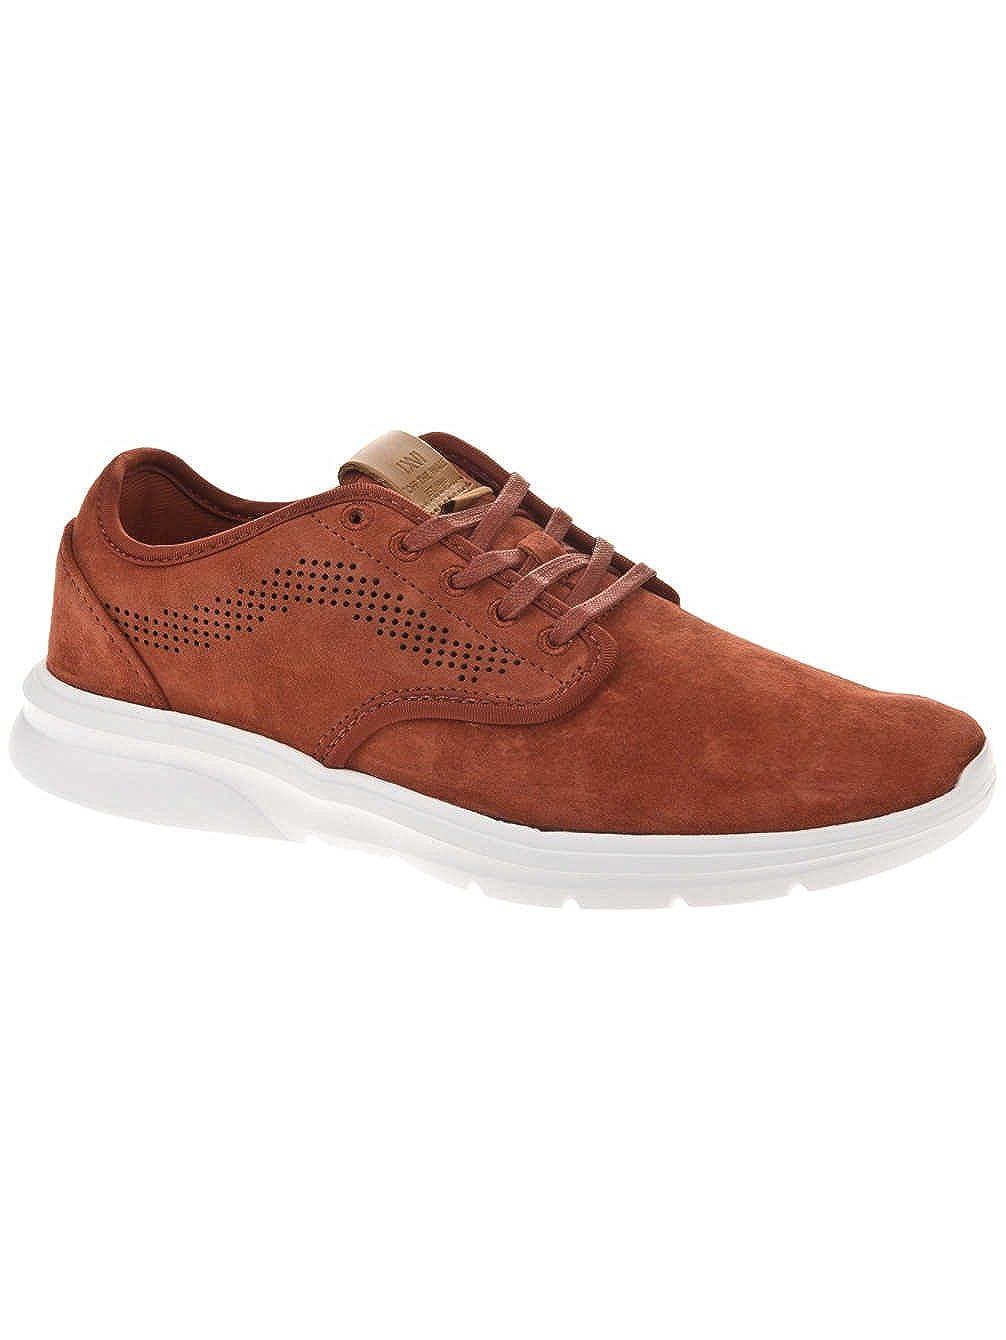 Vans Sneaker M ISO 2 Marrone EU 44.5 (US 11): Amazon.it